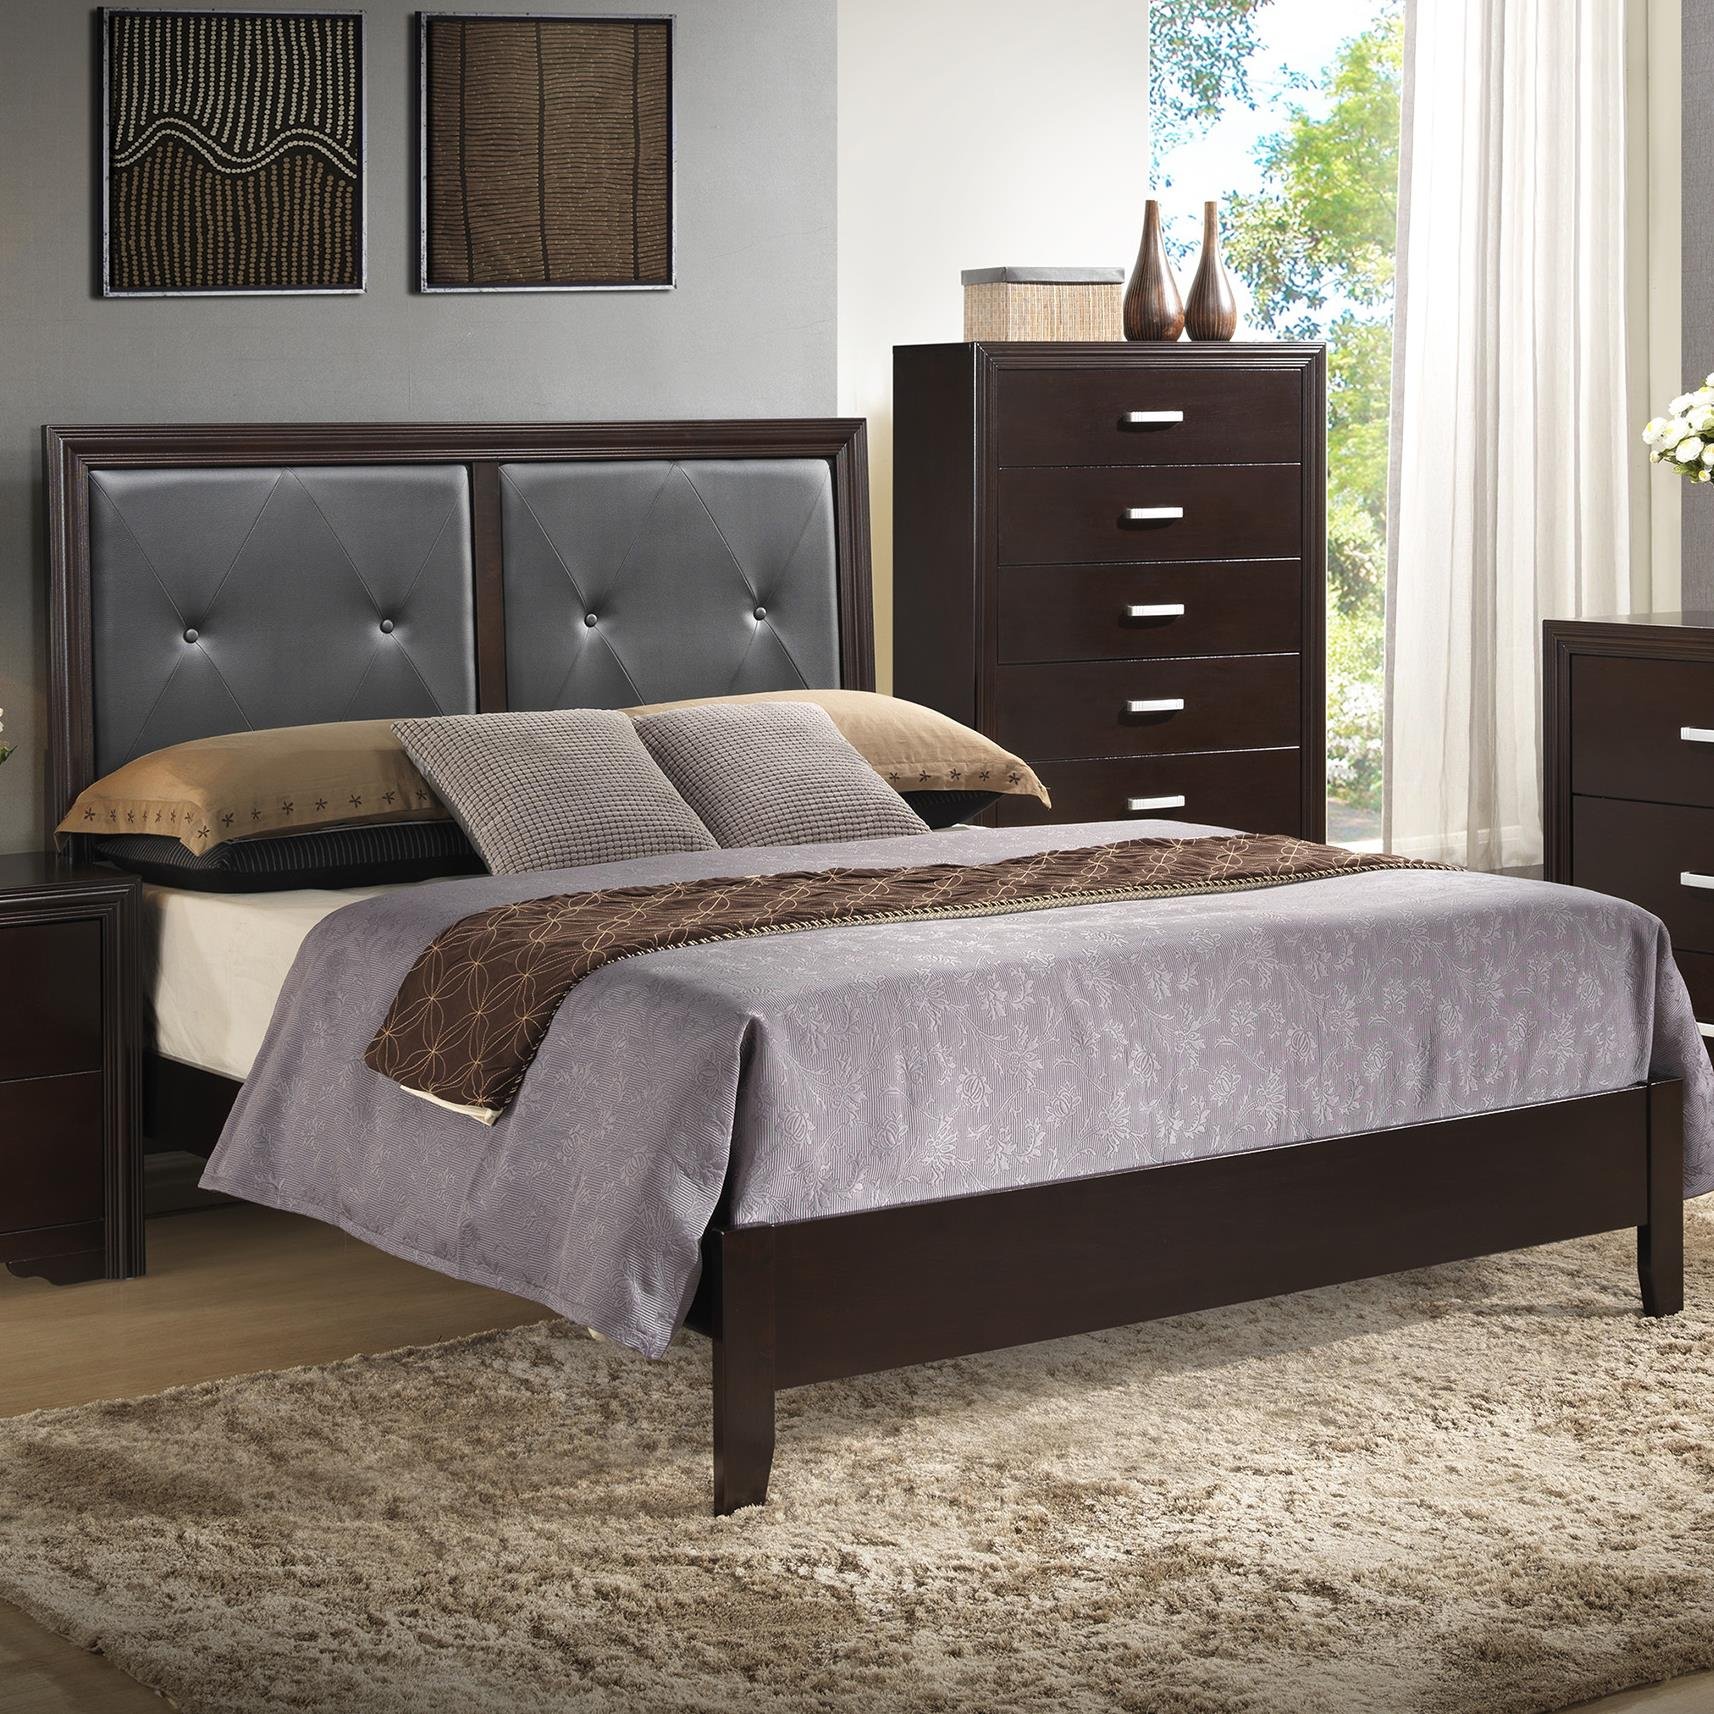 Crown Mark Elijah King Upholstered Bed - Item Number: B5300-KQ-RAIL+B5300-K-HBFB